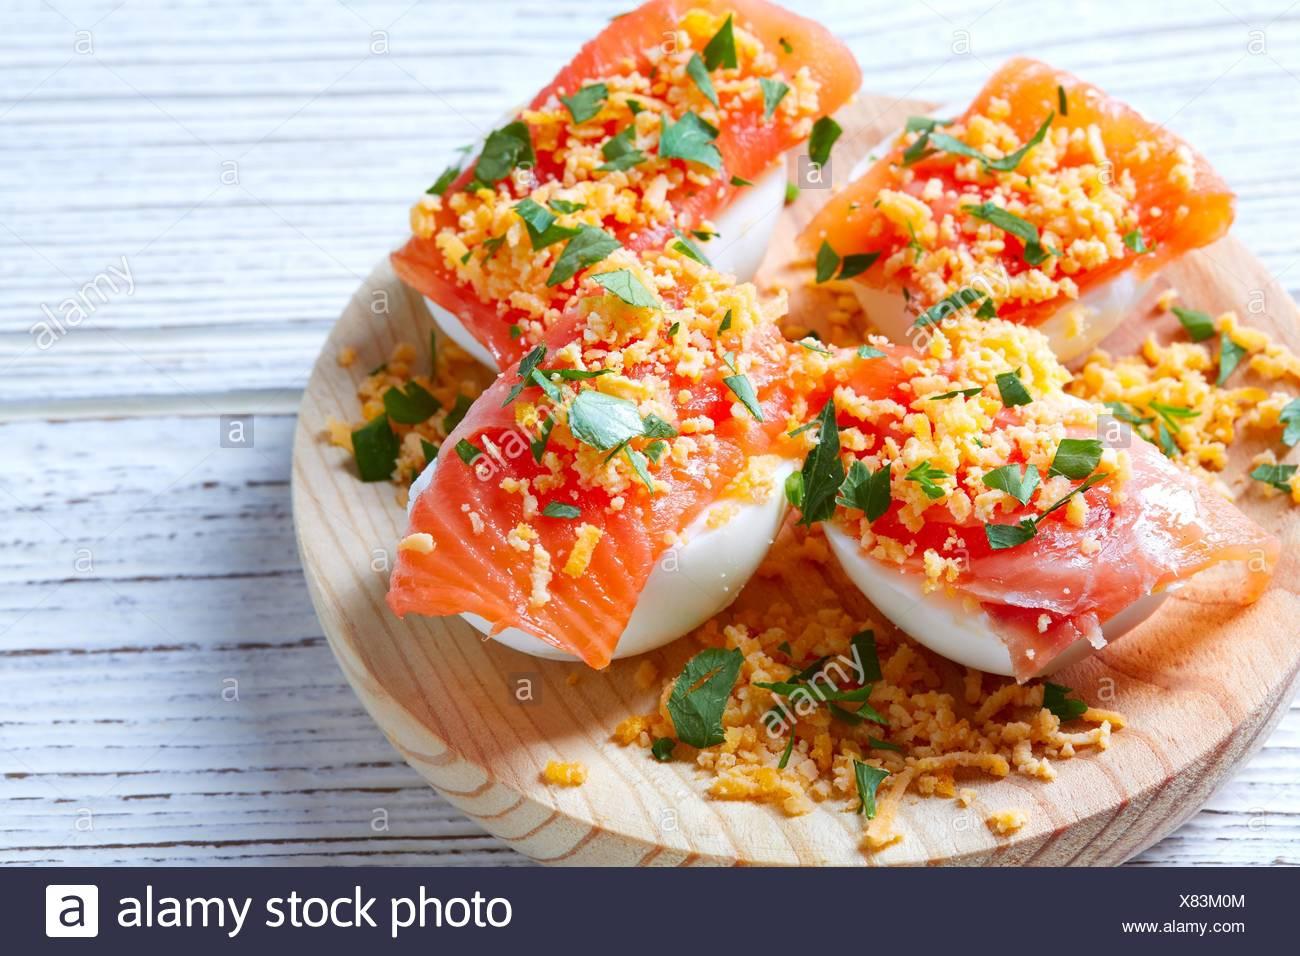 Huevos Rellenos Con Salmón Y Pinchos Tapas De España Recetas